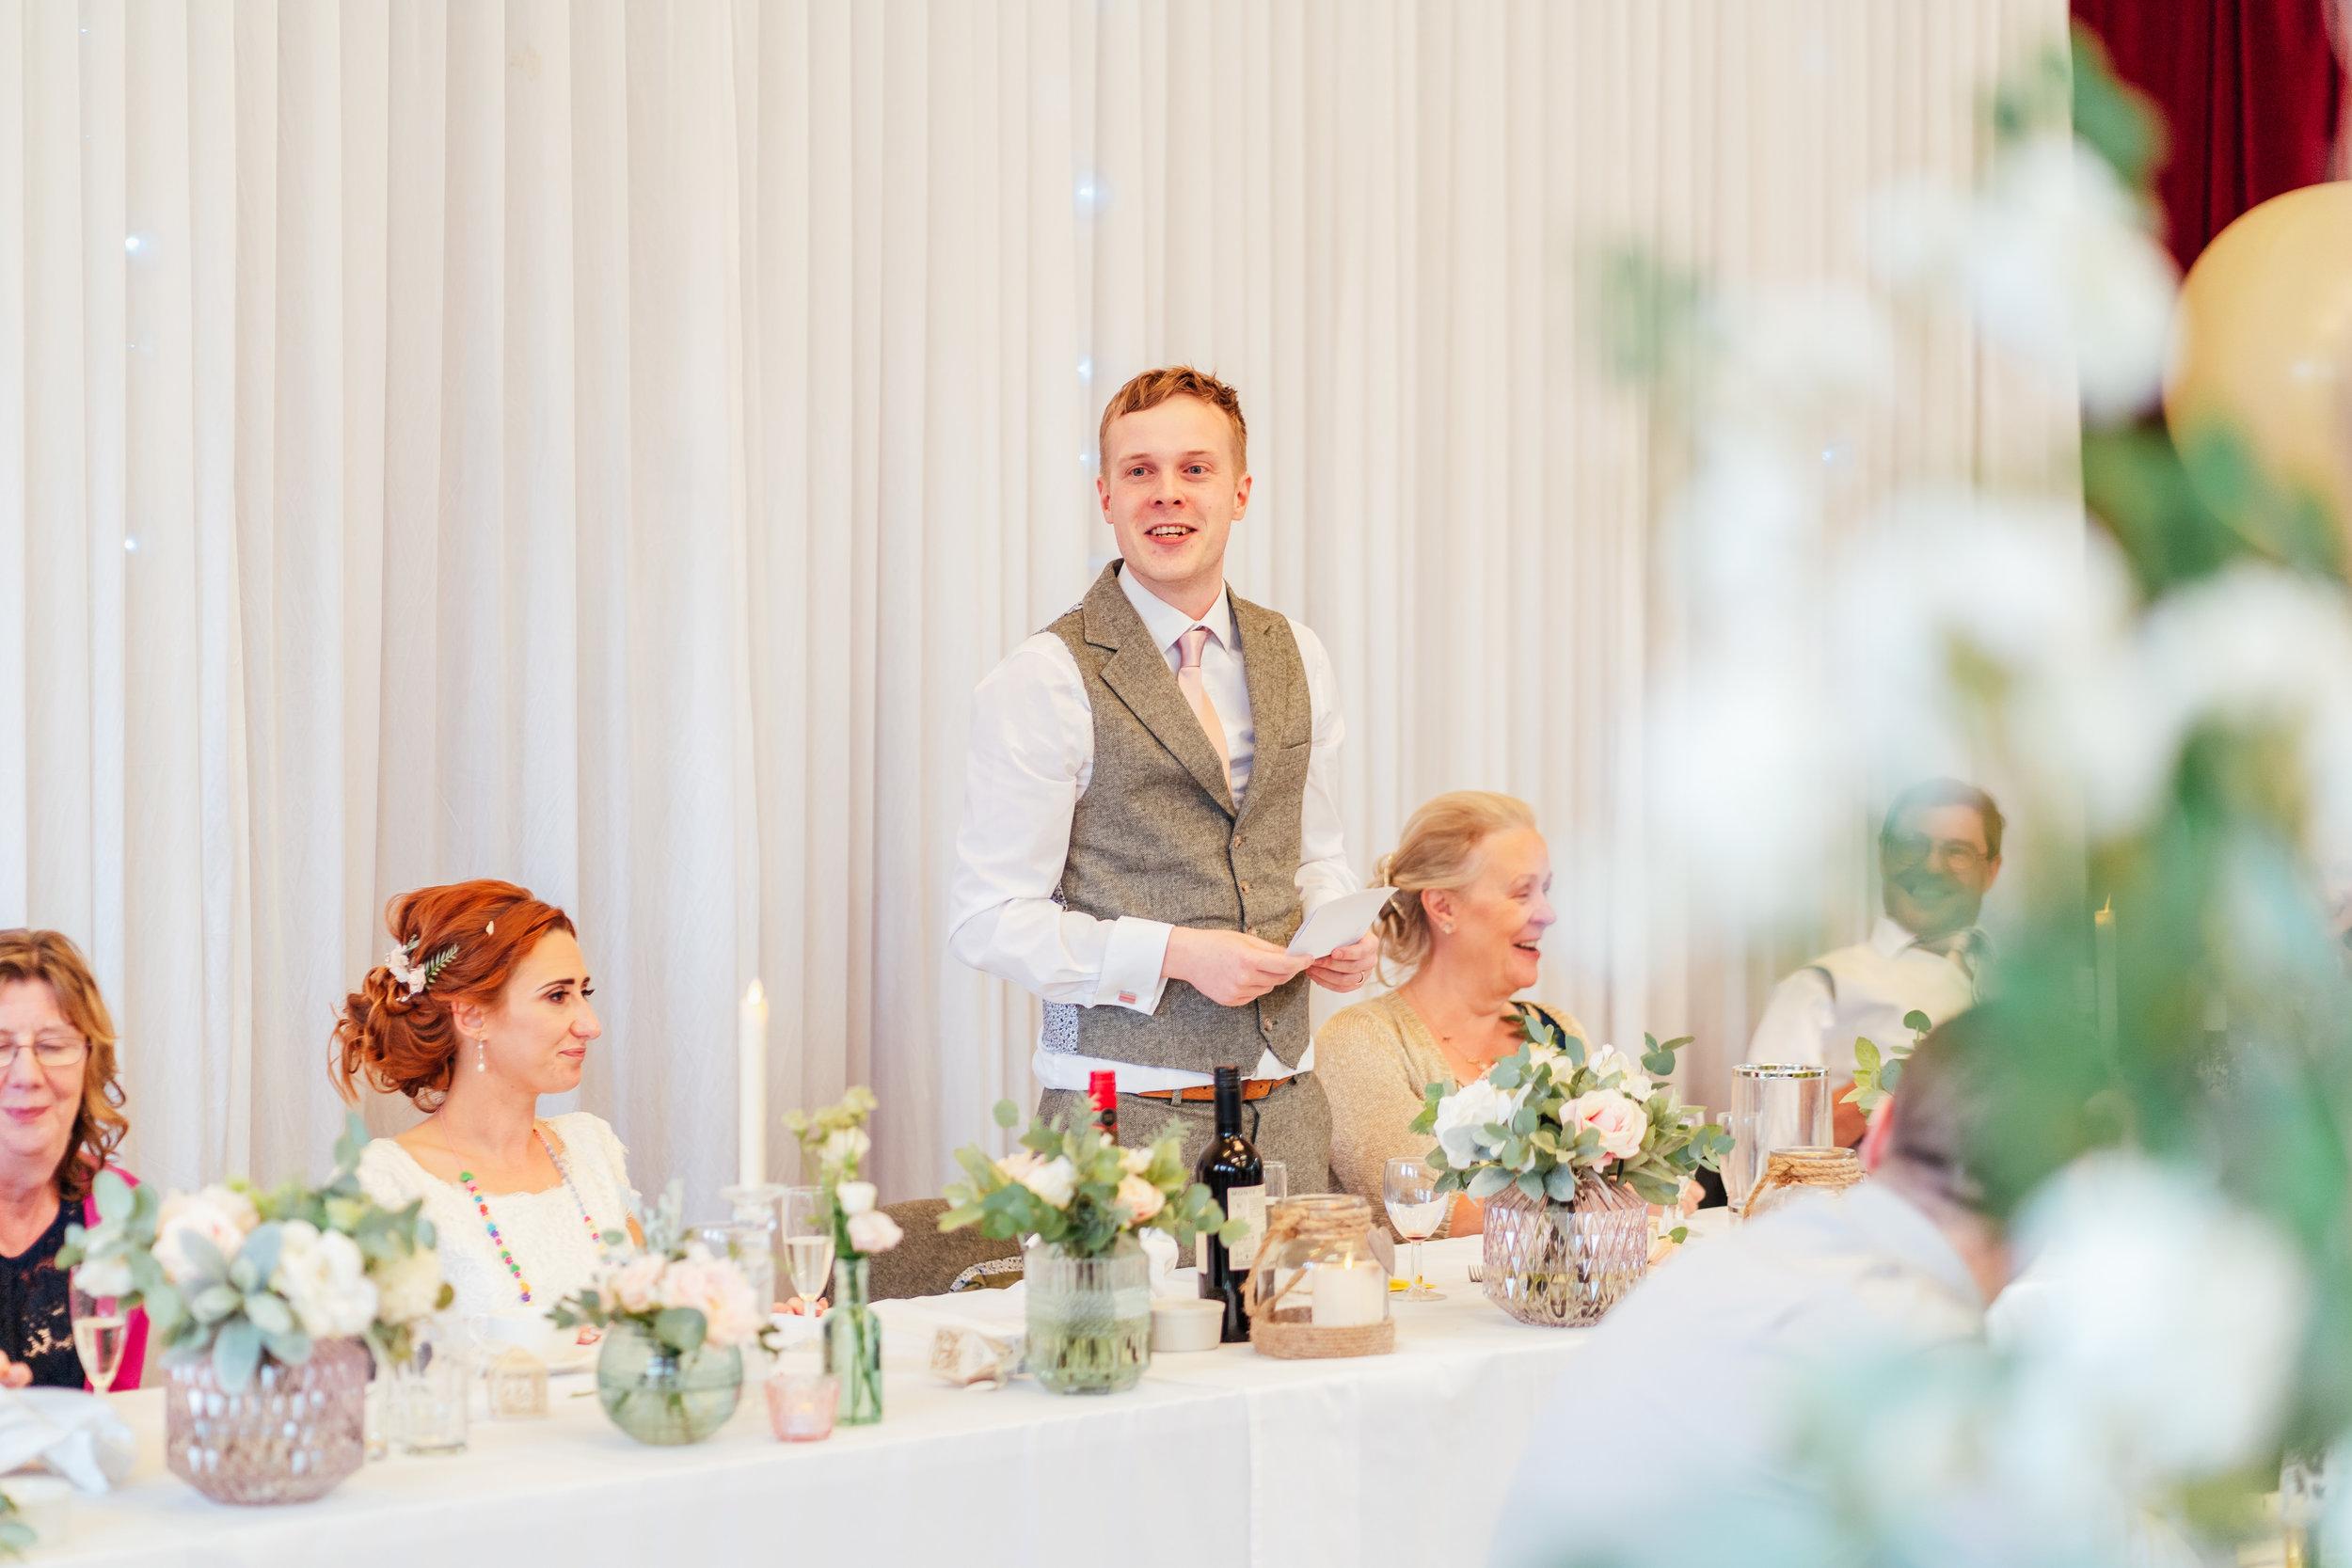 st-georges-hall-liverpool-wedding-236.jpg